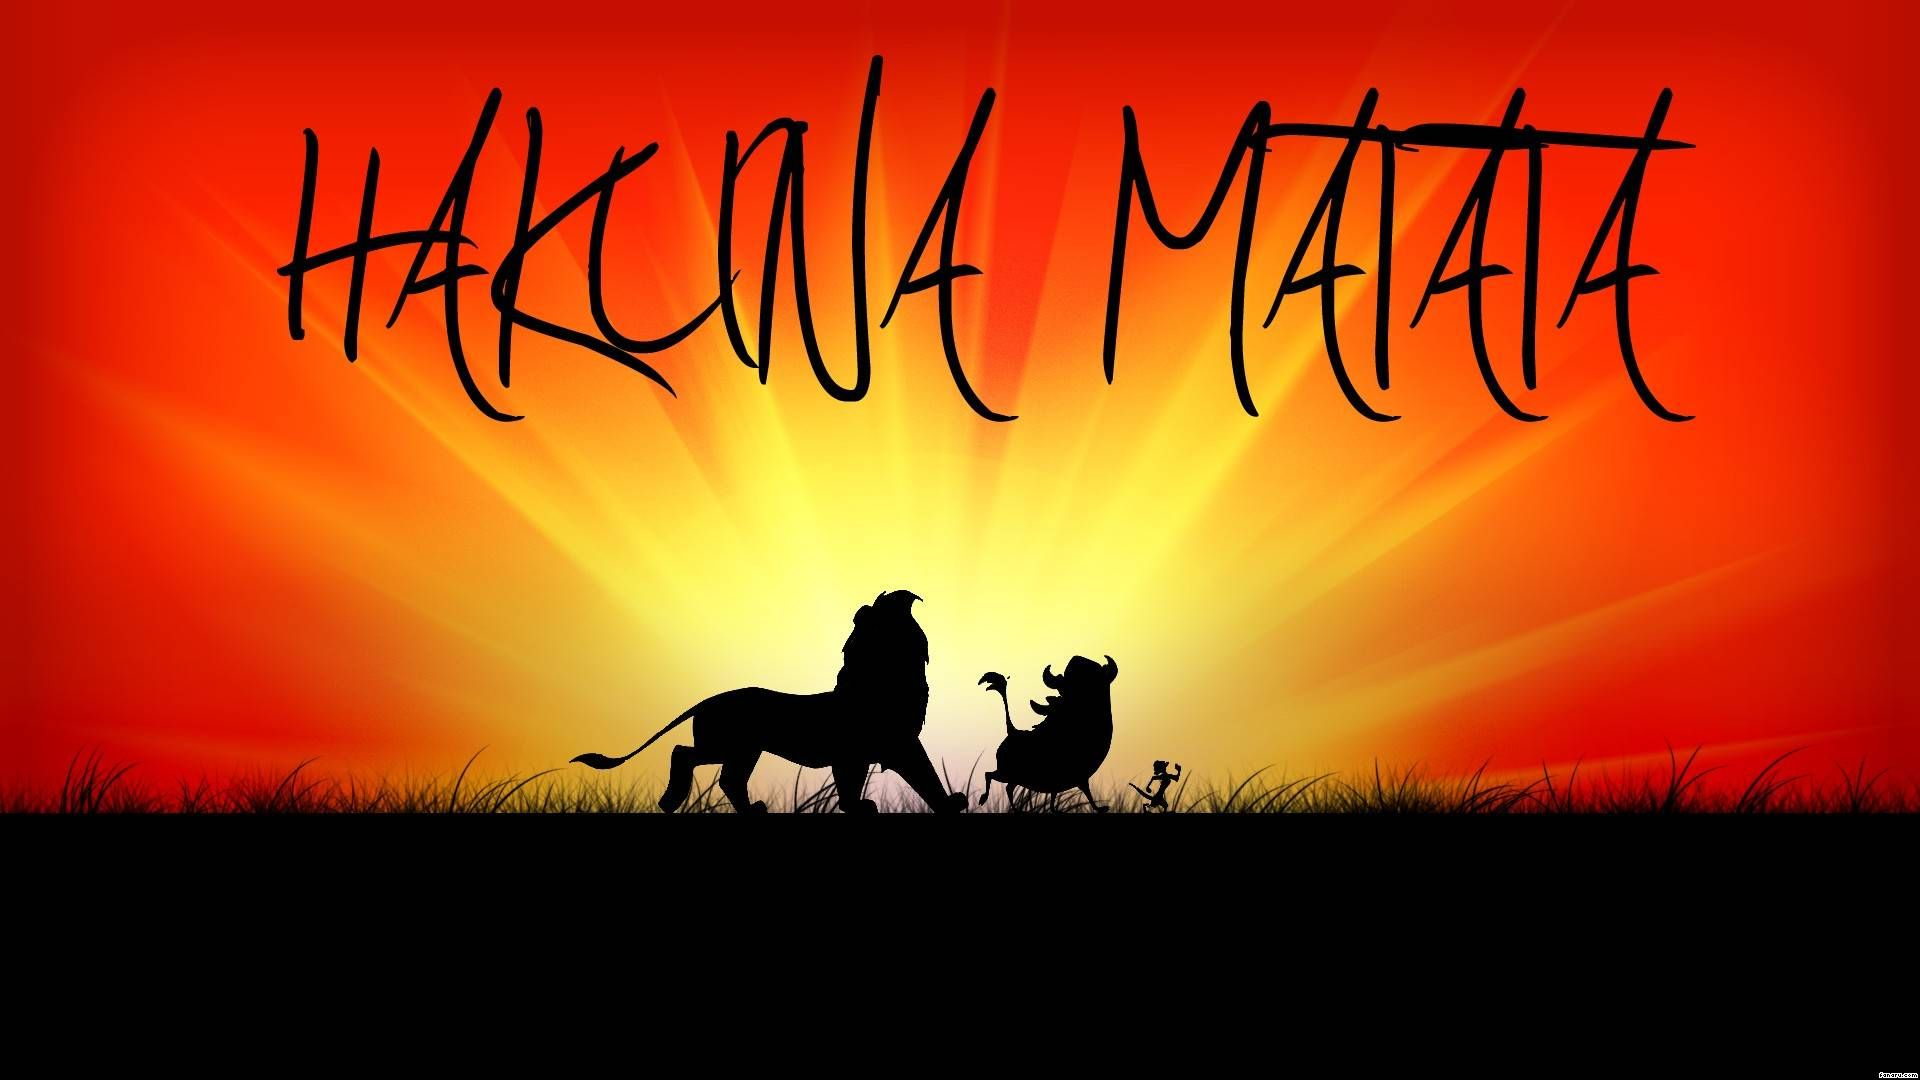 lion king rafiki Hakuna Matata, Simba, Pumbaa, and Timon